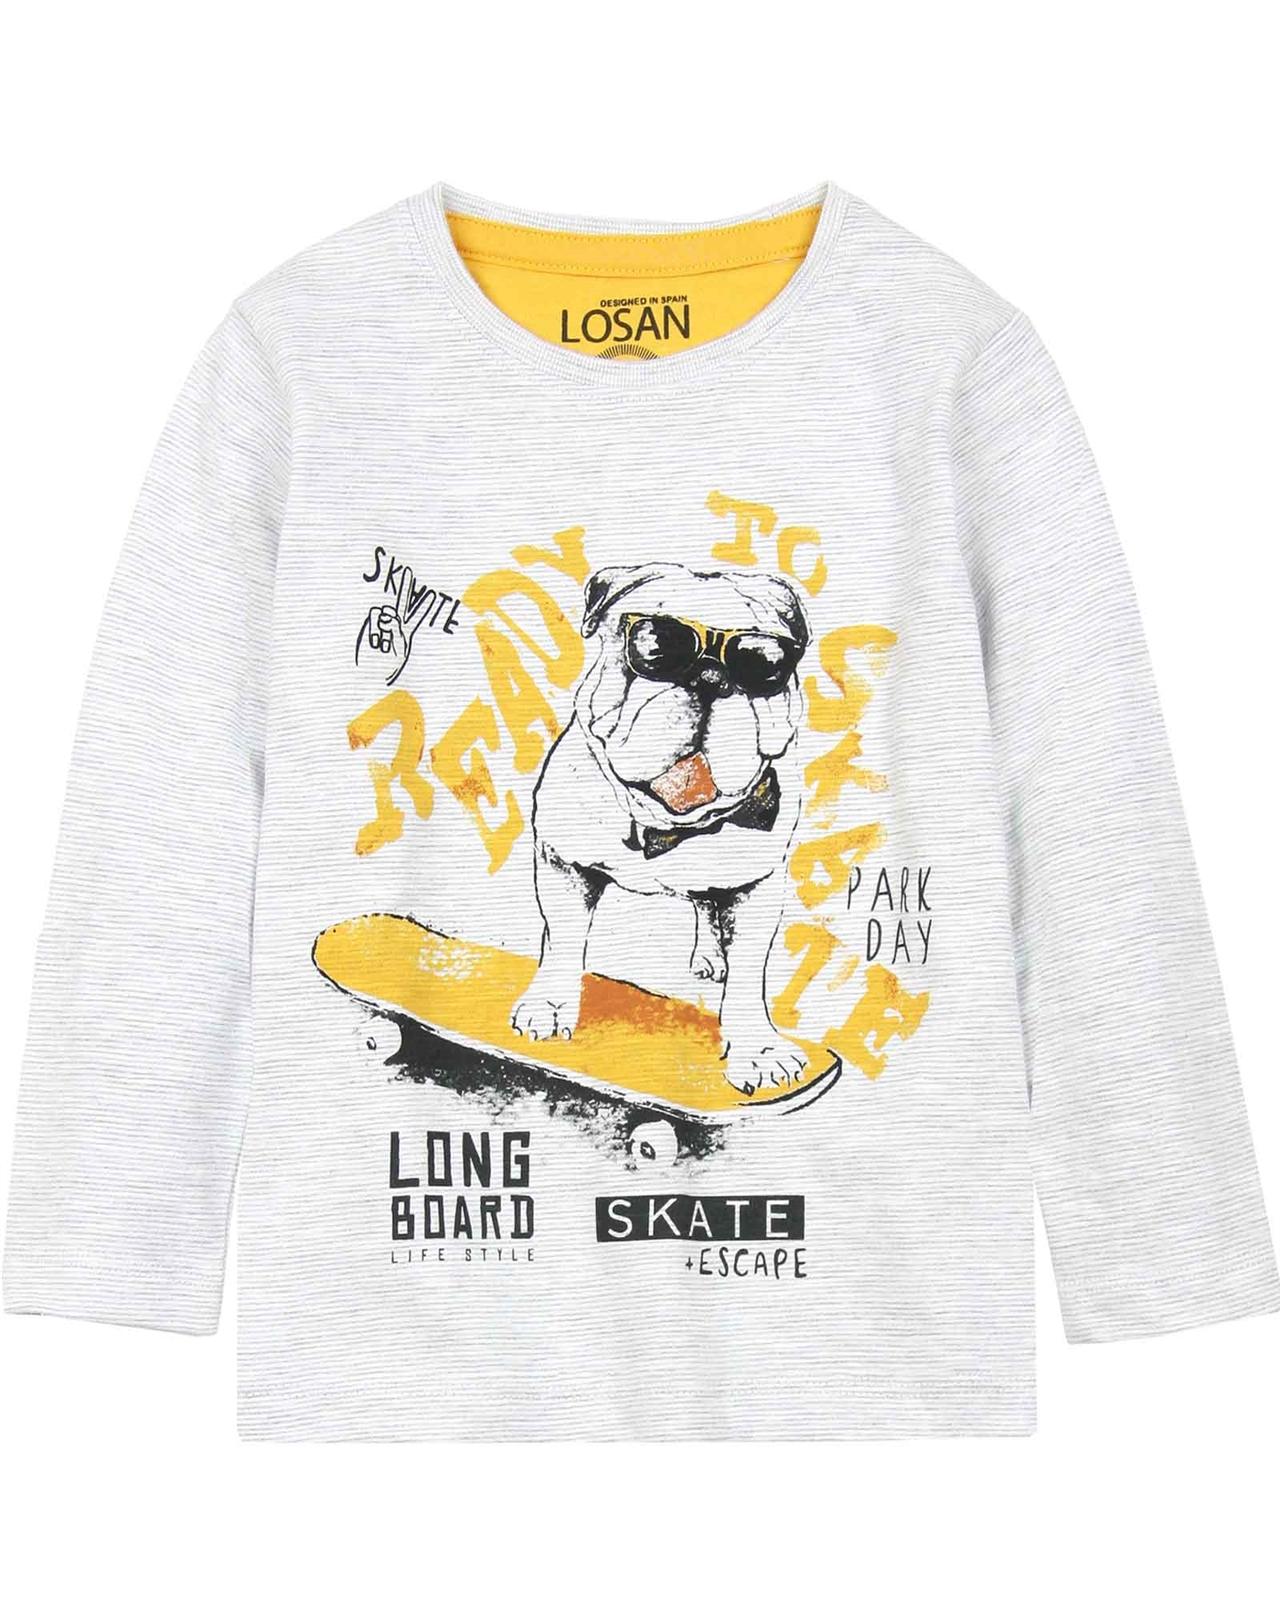 Losan Boys Nehru Collar Shirt Sizes 2-7